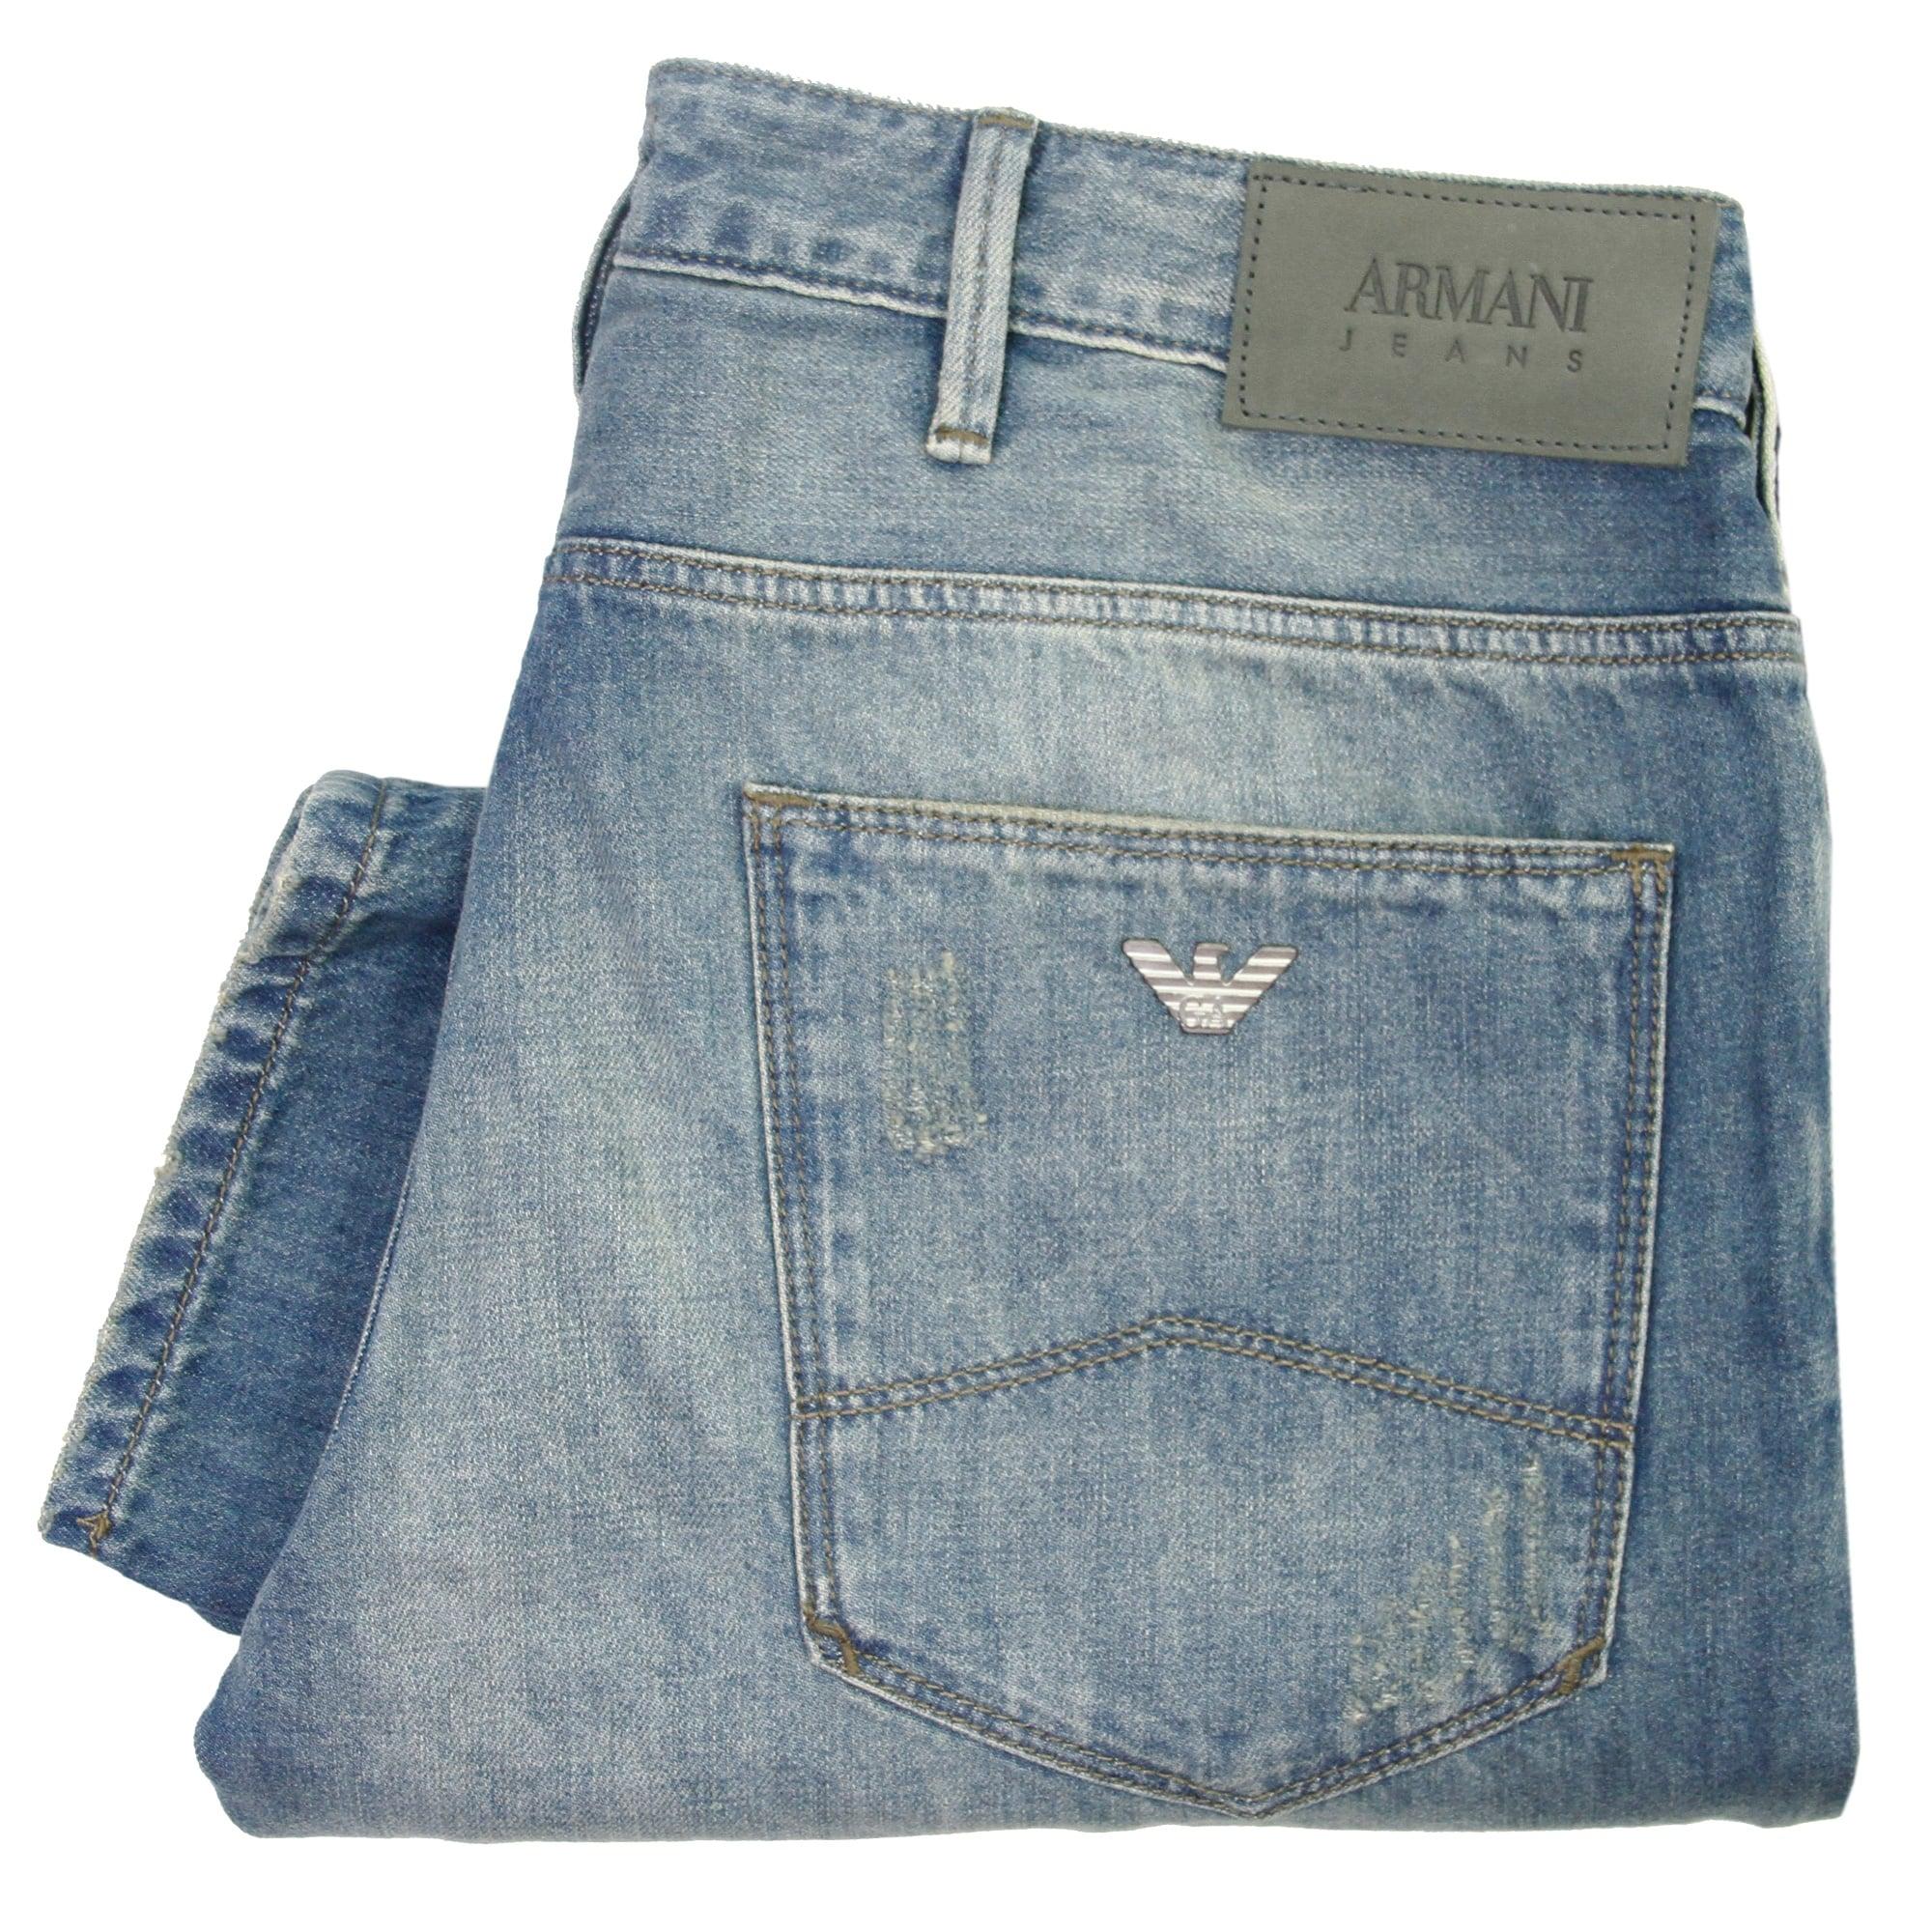 armani jeans online